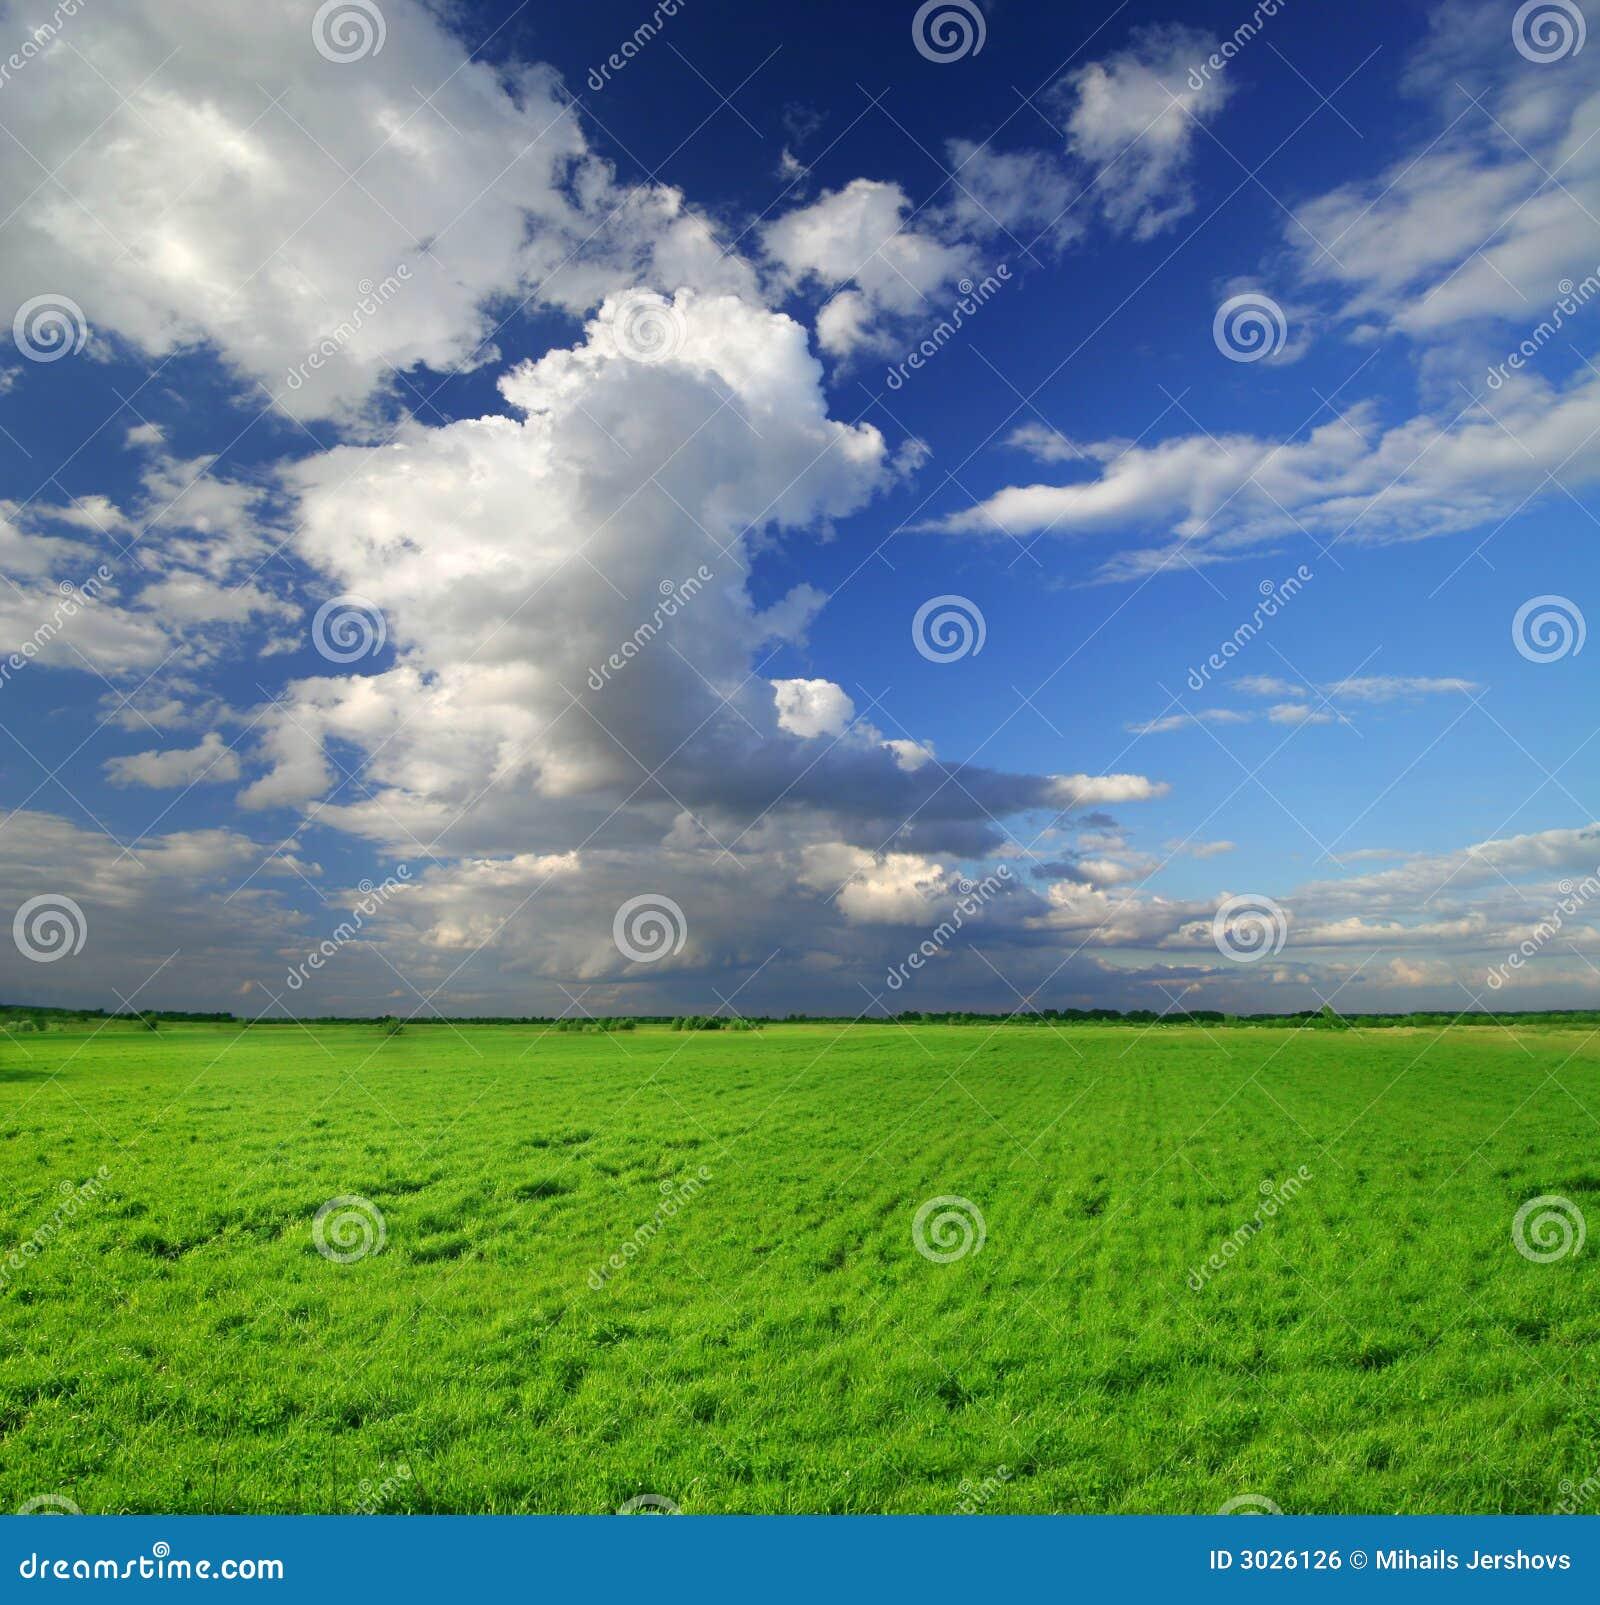 Beautiful Garden Scene Sunny Day Stock Image - Image of ...  |Sunny Beautiful Day